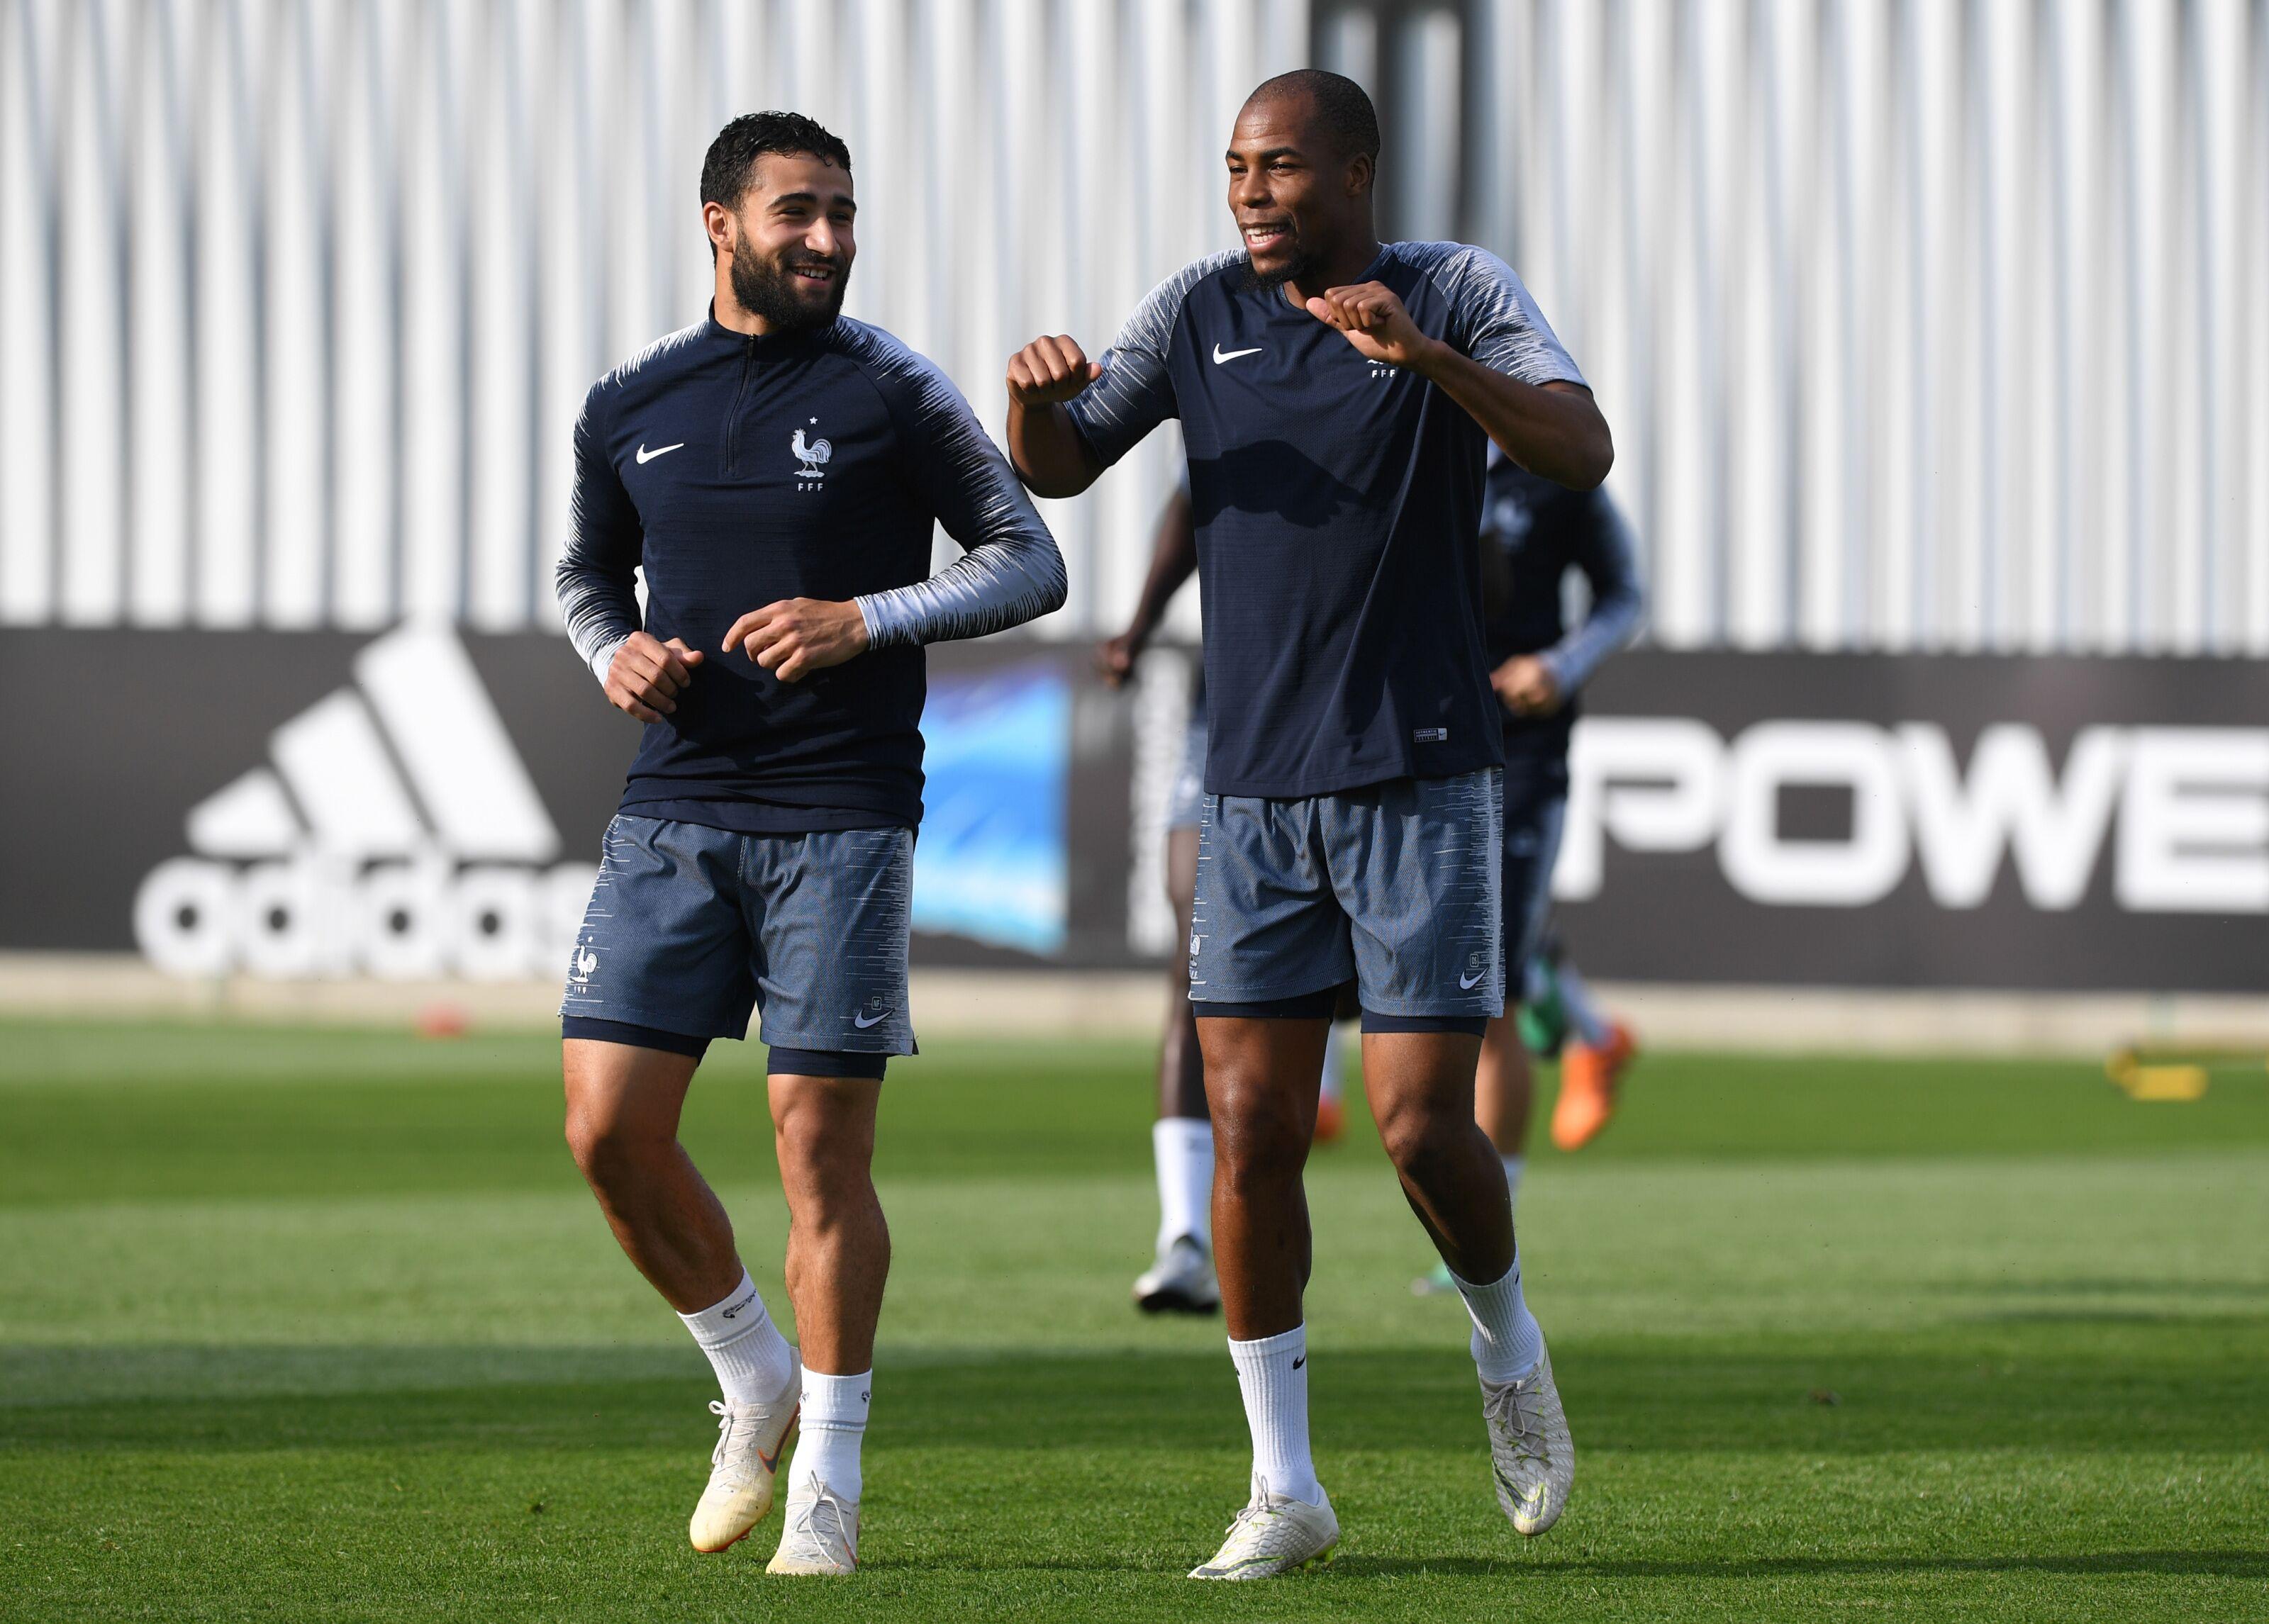 Two European giants now ahead of Liverpool for Nabil Fekir transfer